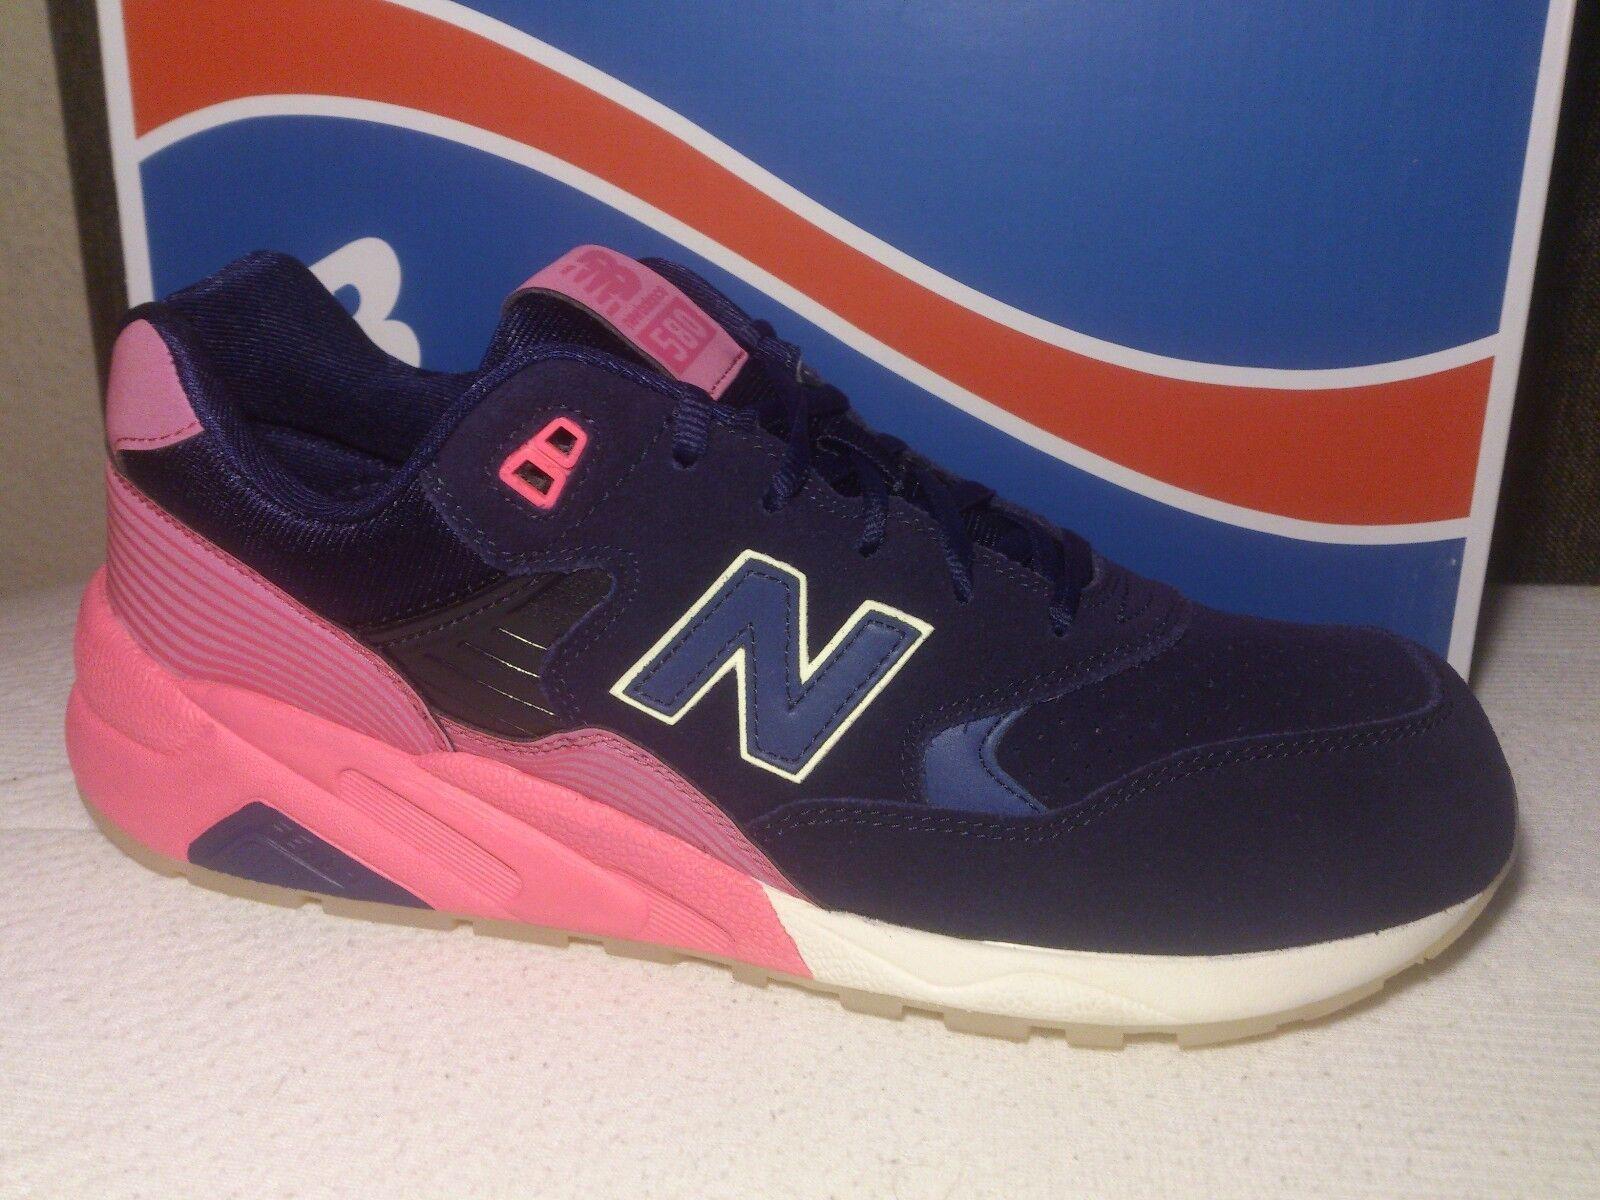 New Balance MRT580UP Größe 42,5, 43, 44 Herren Schuhe Sneaker Blau Pink NEU